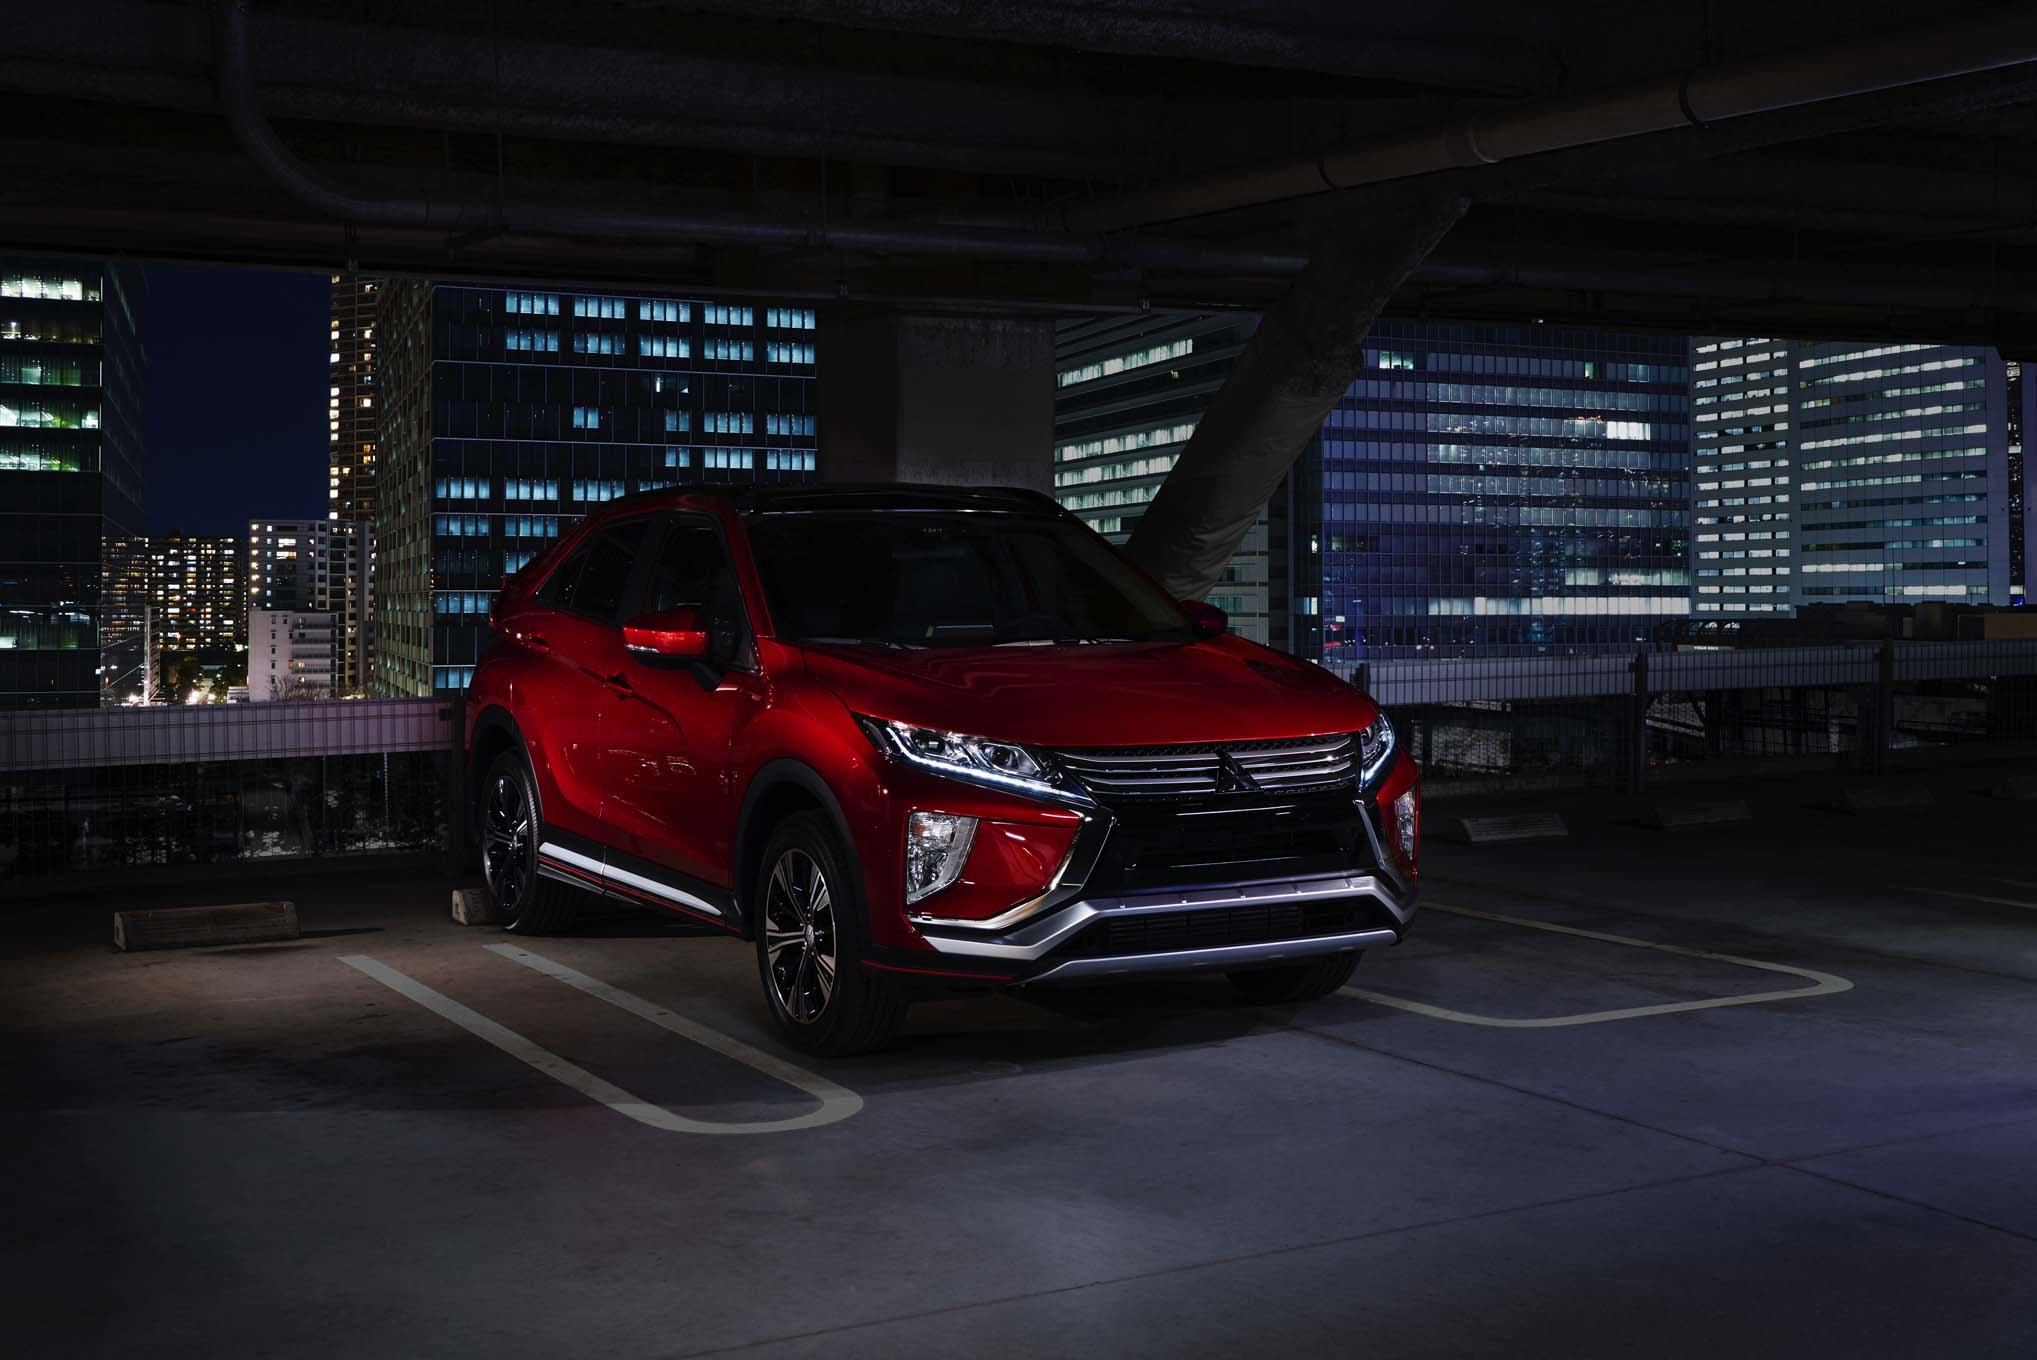 2018 Mitsubishi Eclipse Cross Front Three Quarter View 1